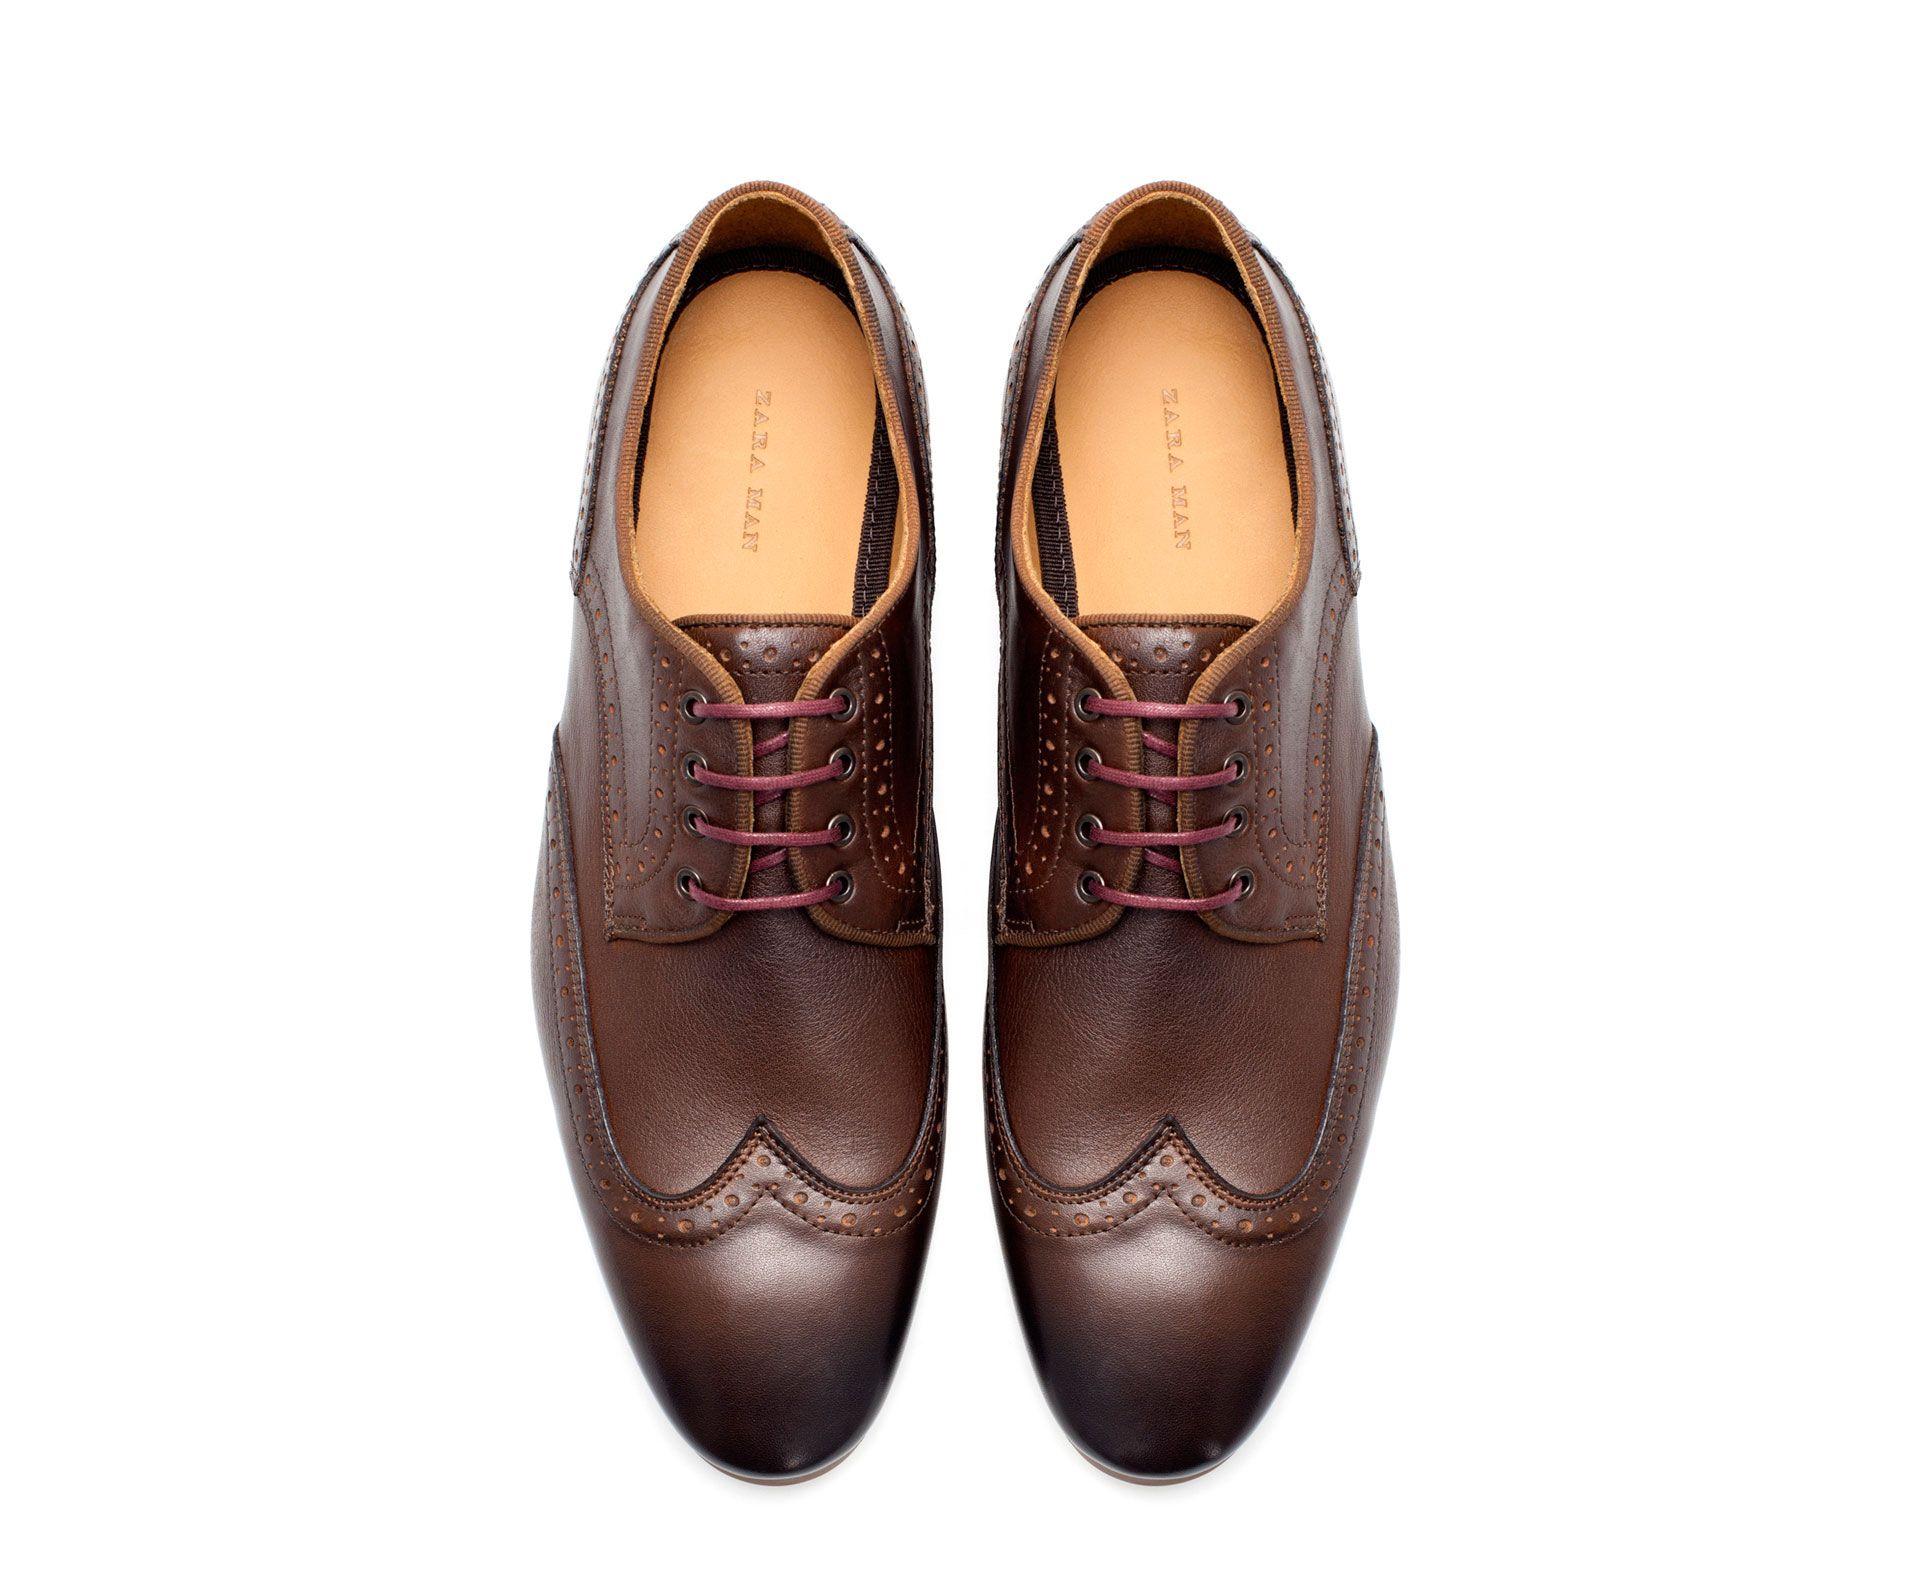 URBAN BLUCHER - Shoes - Man | ZARA Mexico